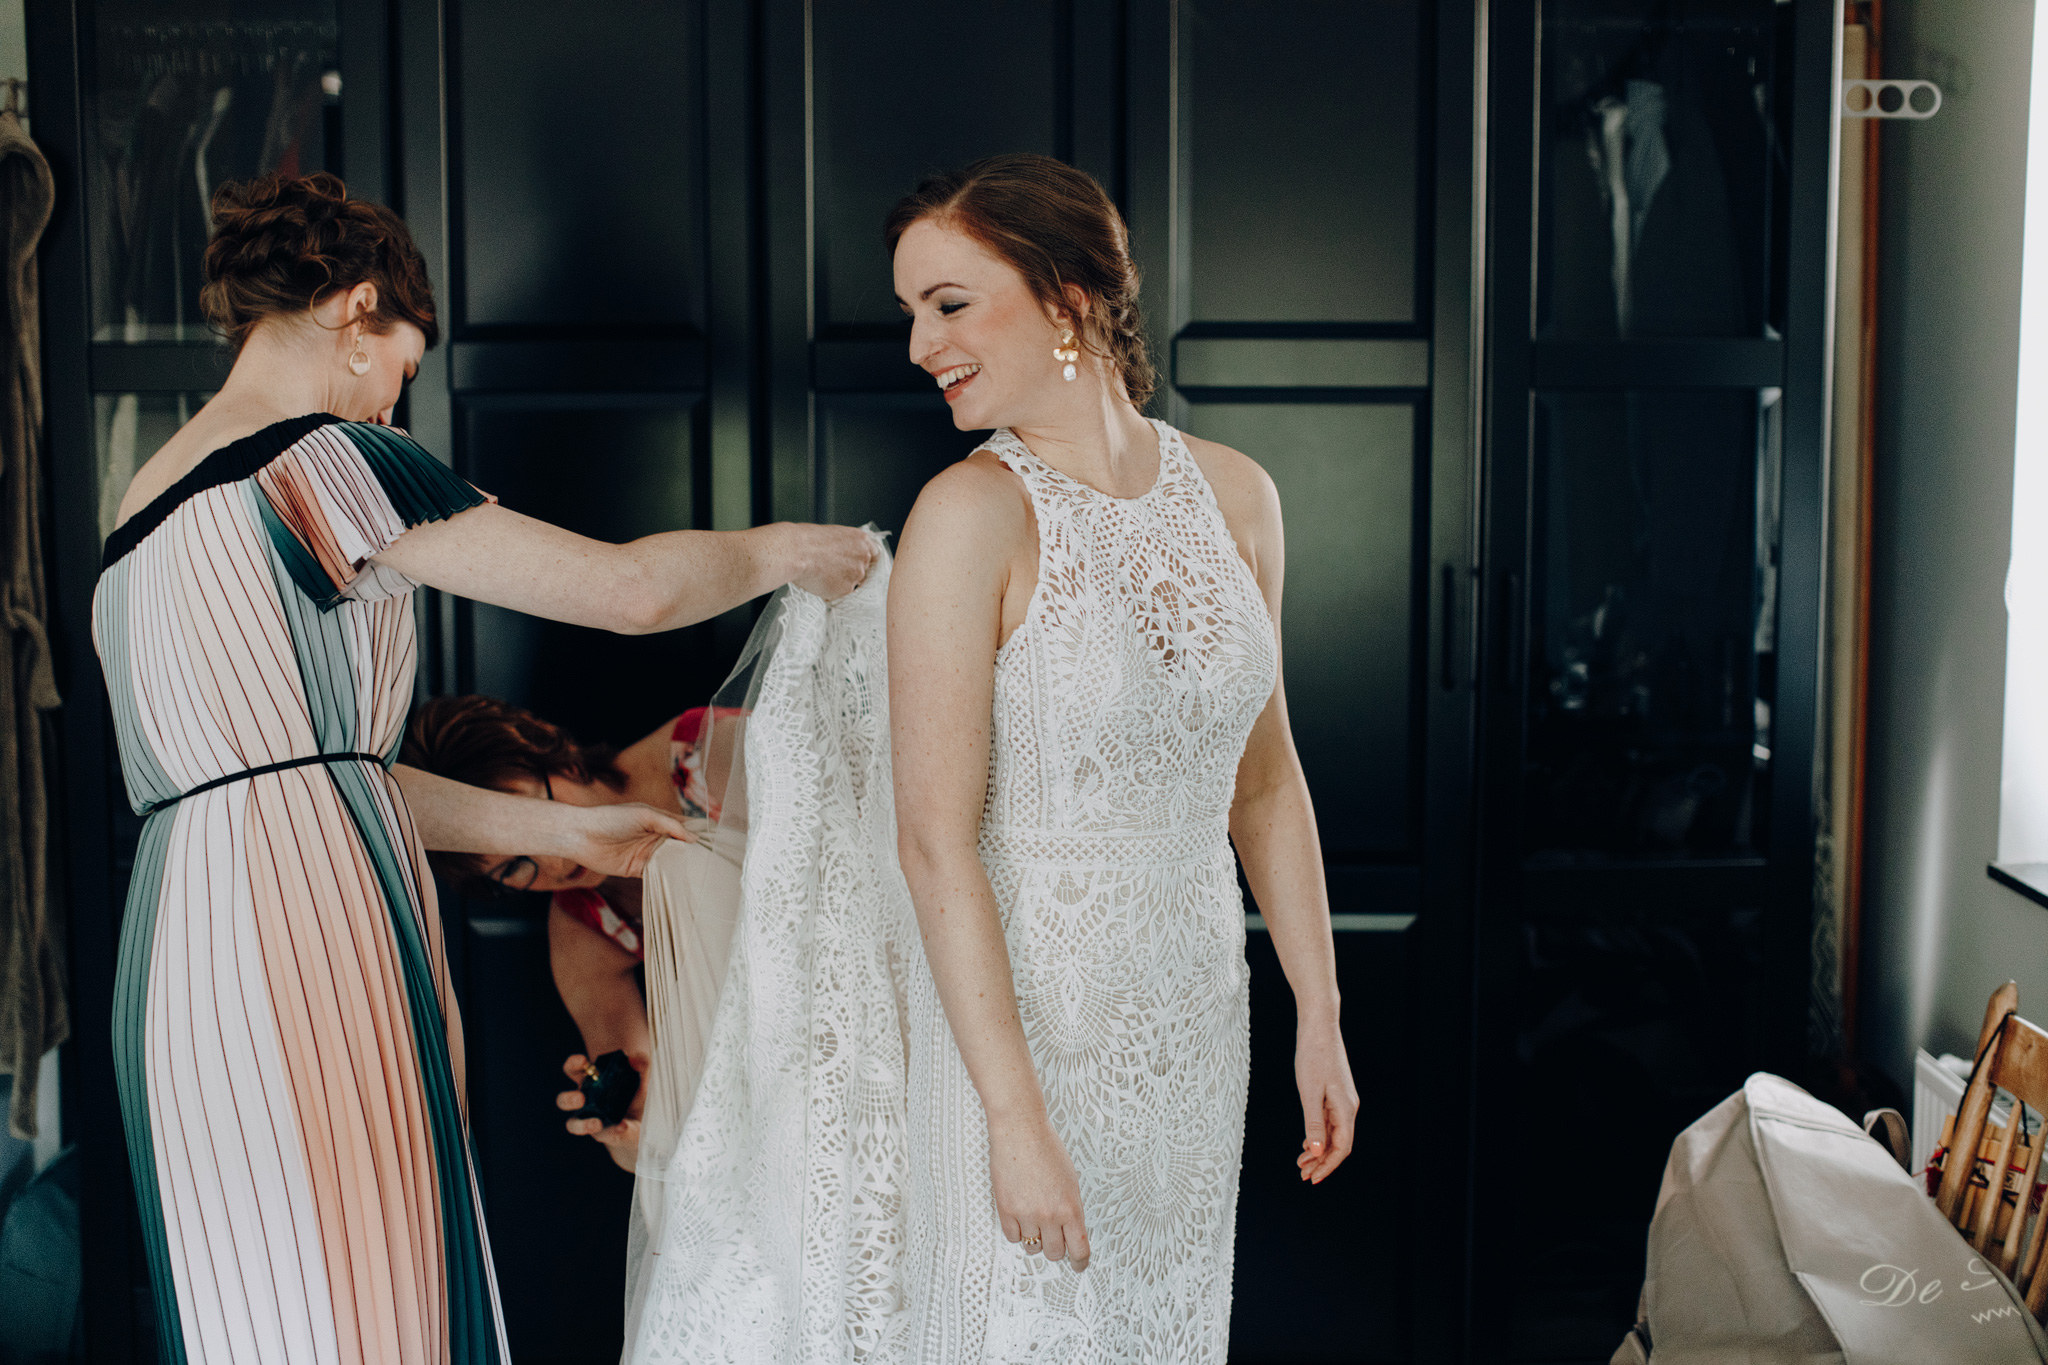 Zus helpt bruid in haar Lillian West trouwjurk